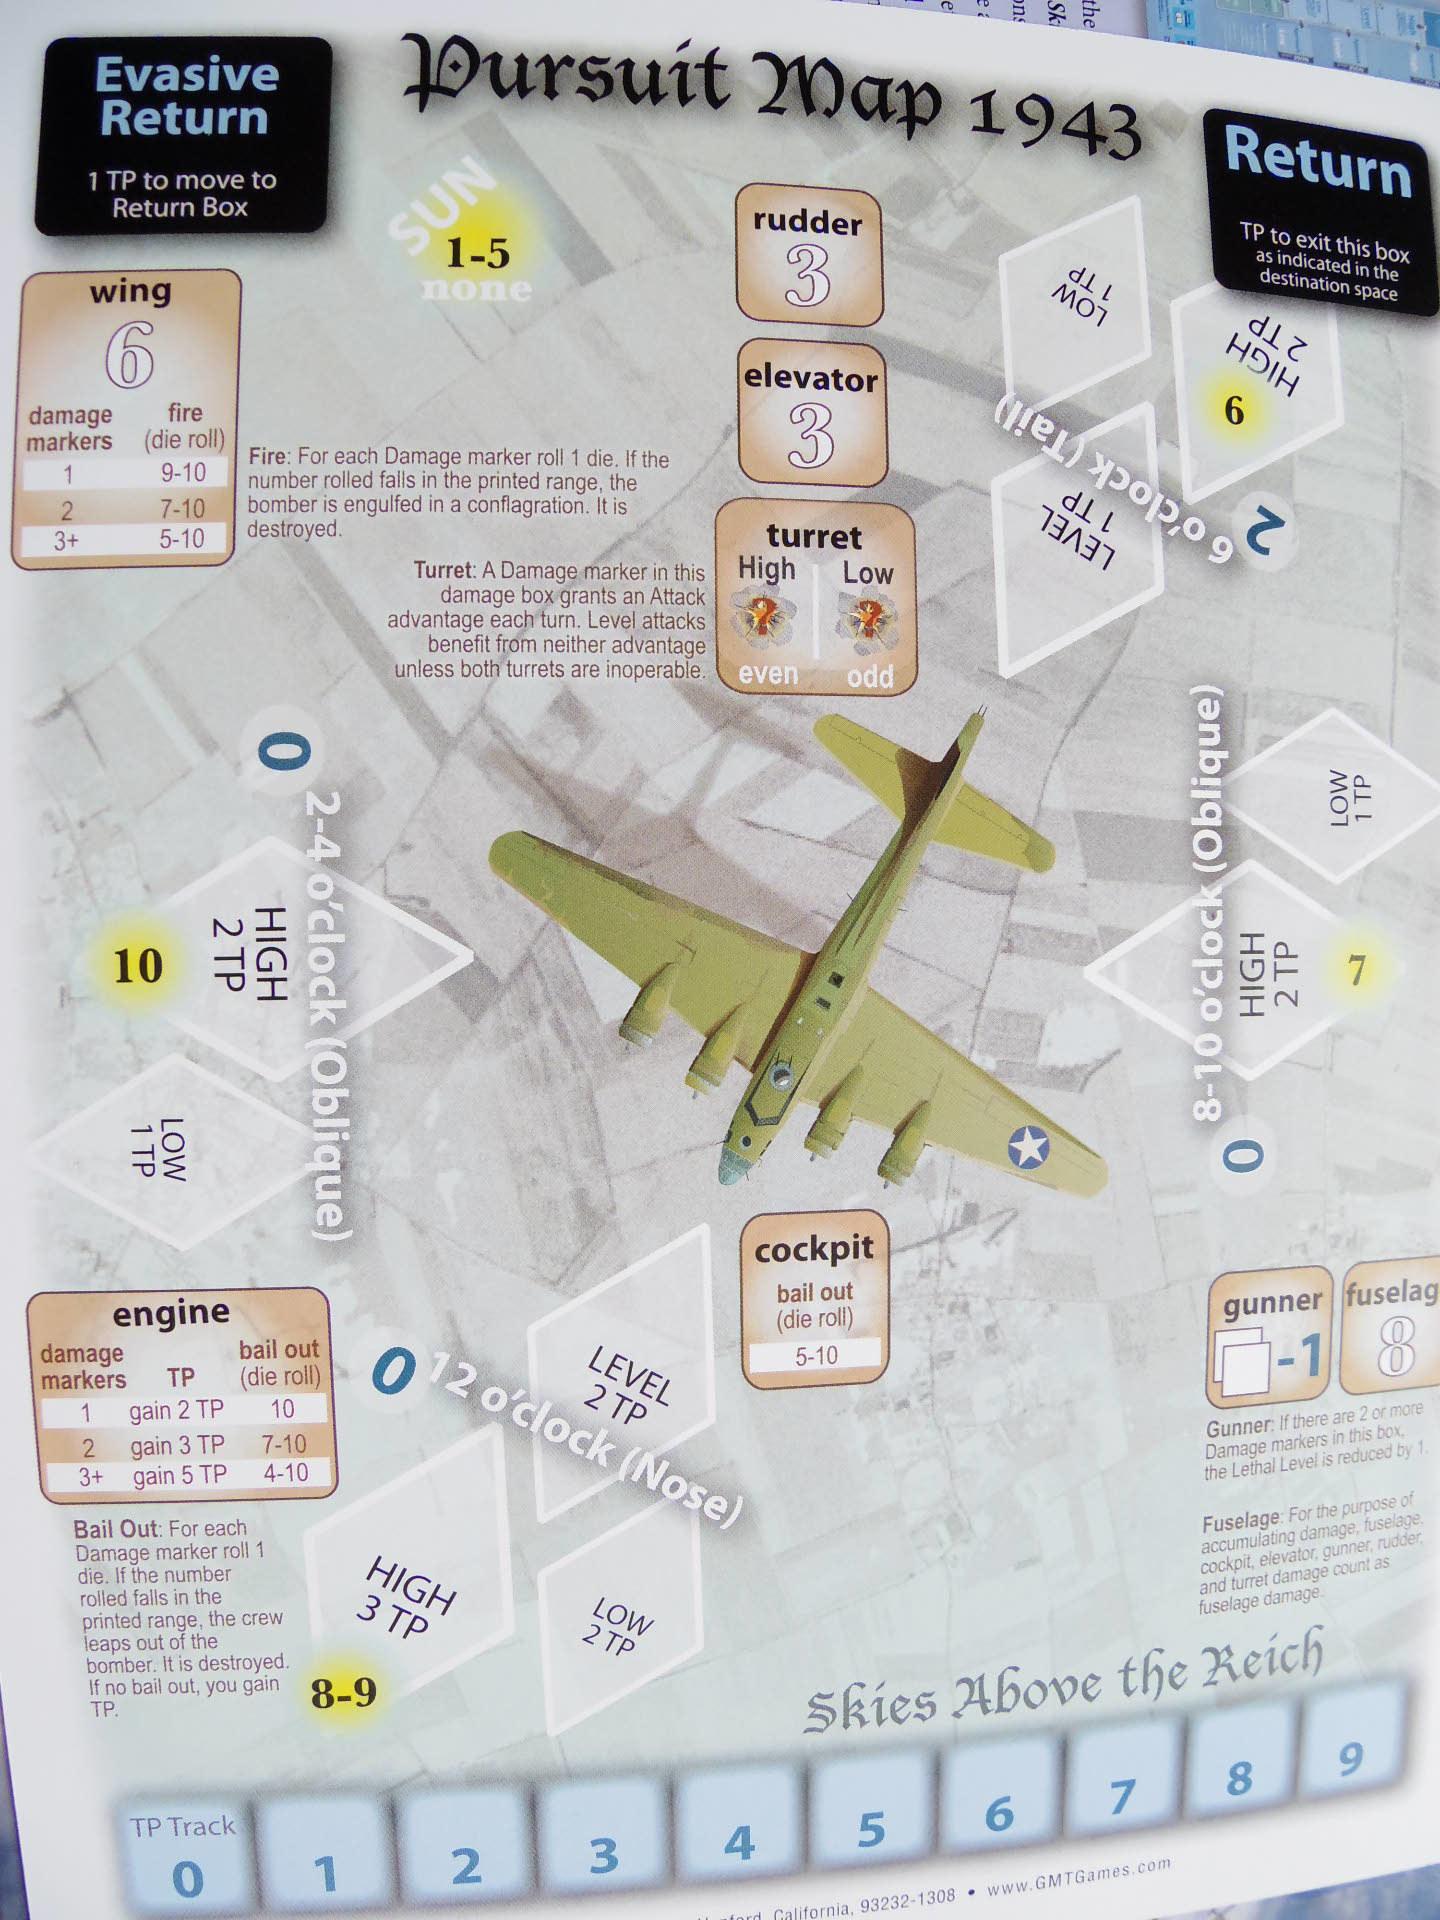 (GMT)Skies Above the Reich ドイツ本土昼間防空戦(ソロ専用)...かつてのウォーゲーム・ブーム期を上回る勢いで続々と出版される最新ゲームたち➁_b0173672_22542896.jpg